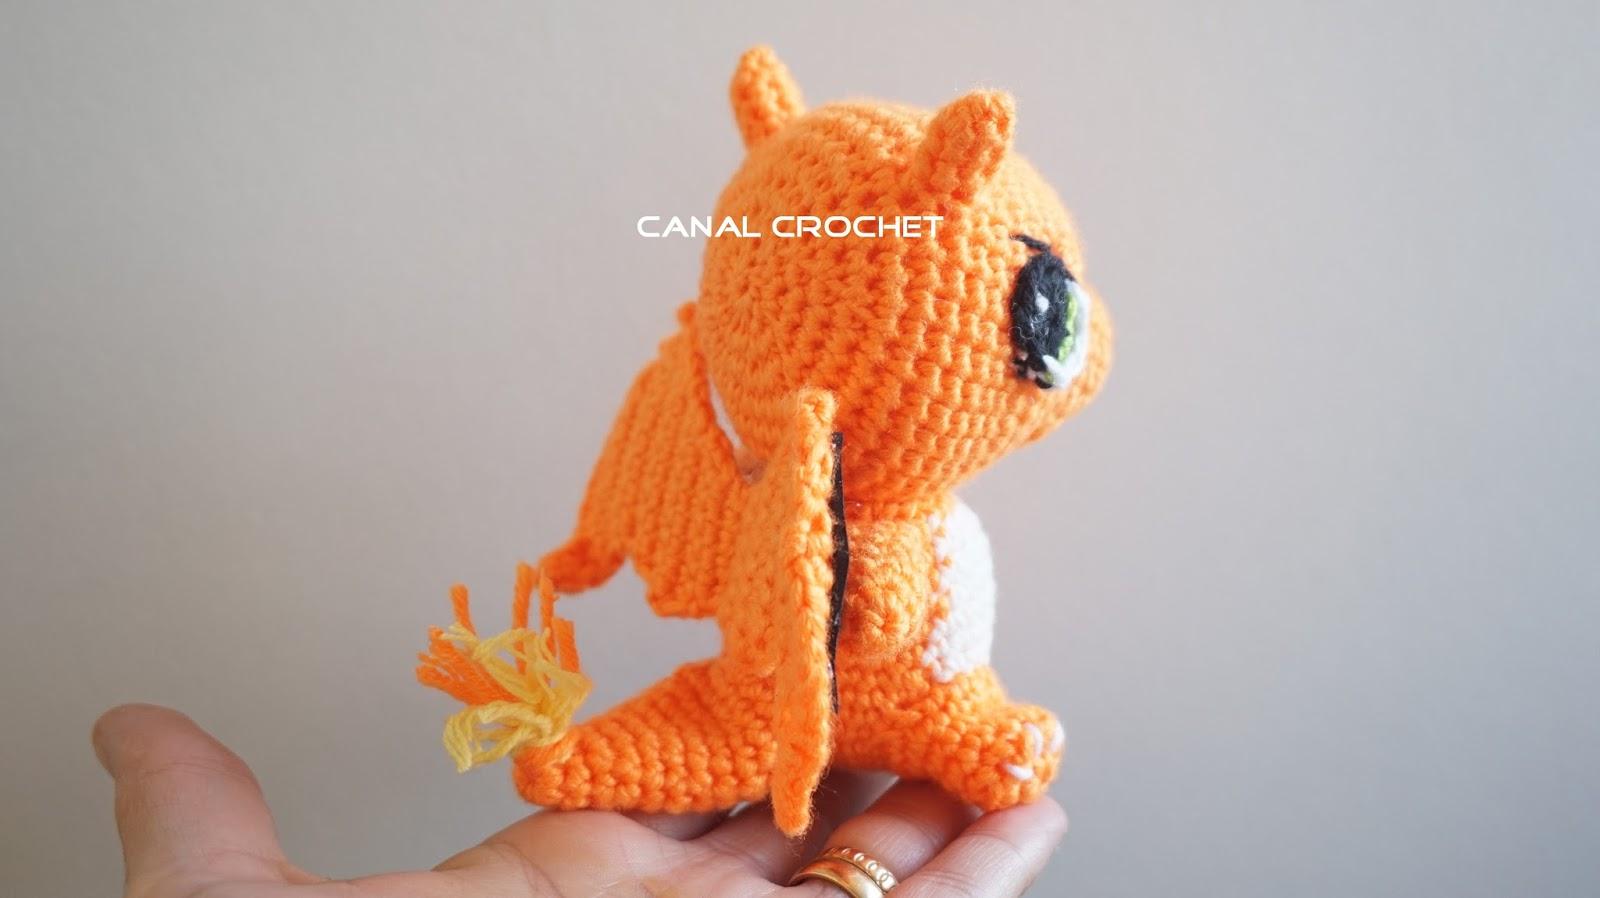 Amigurumi Pokemon Espanol : CANAL CROCHET: Charmander pokemon amigurumi